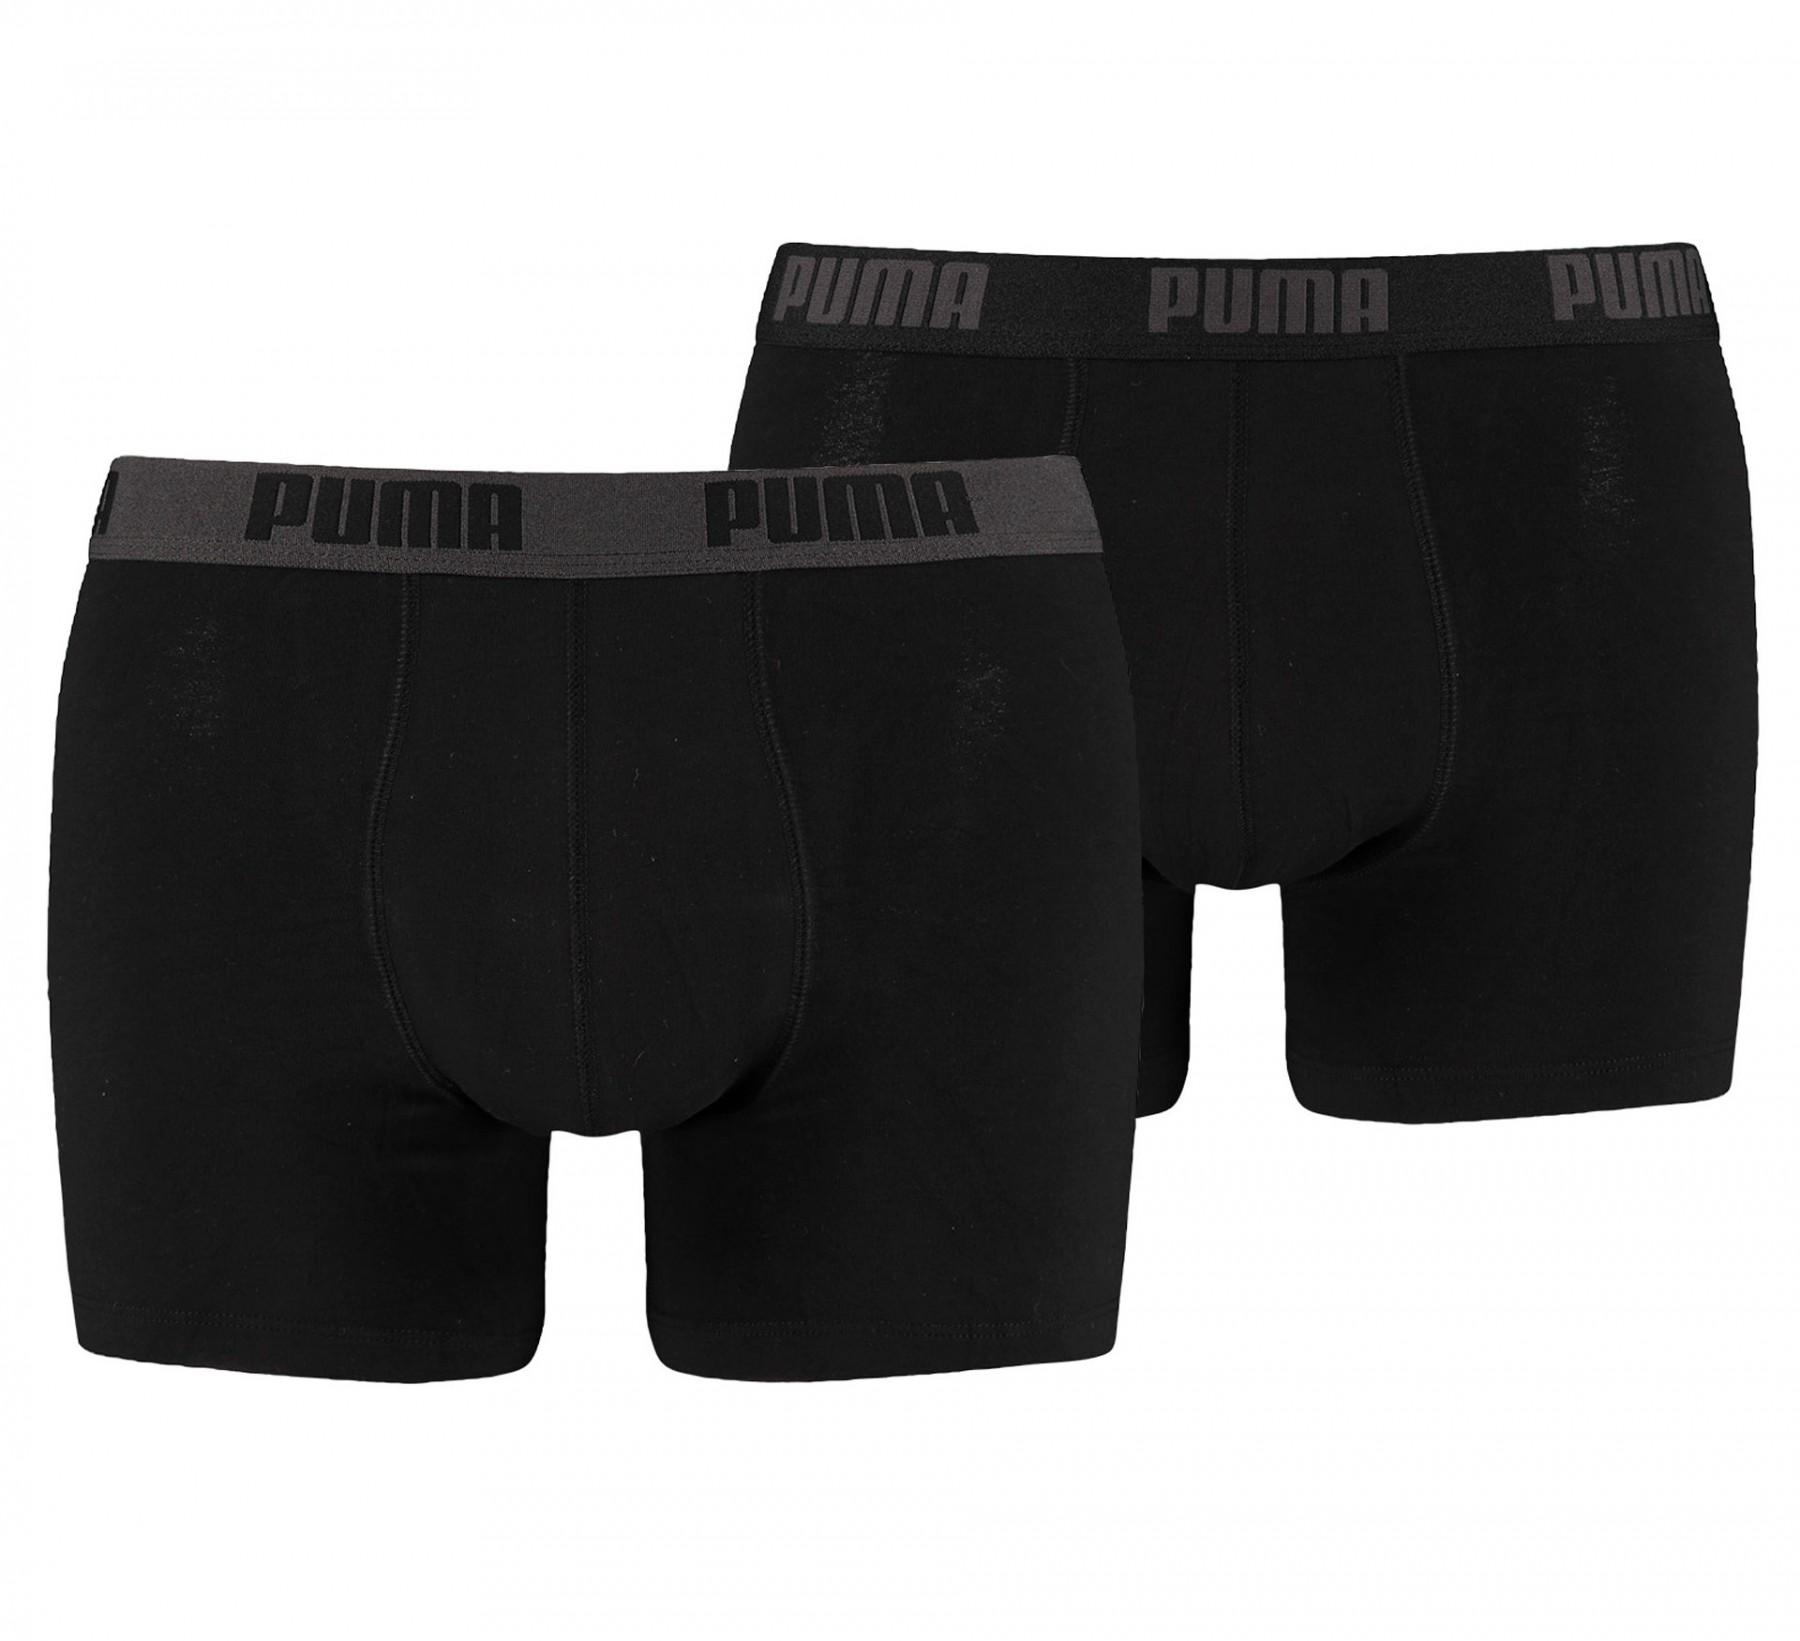 Pánské boxerky Puma basic 2P black